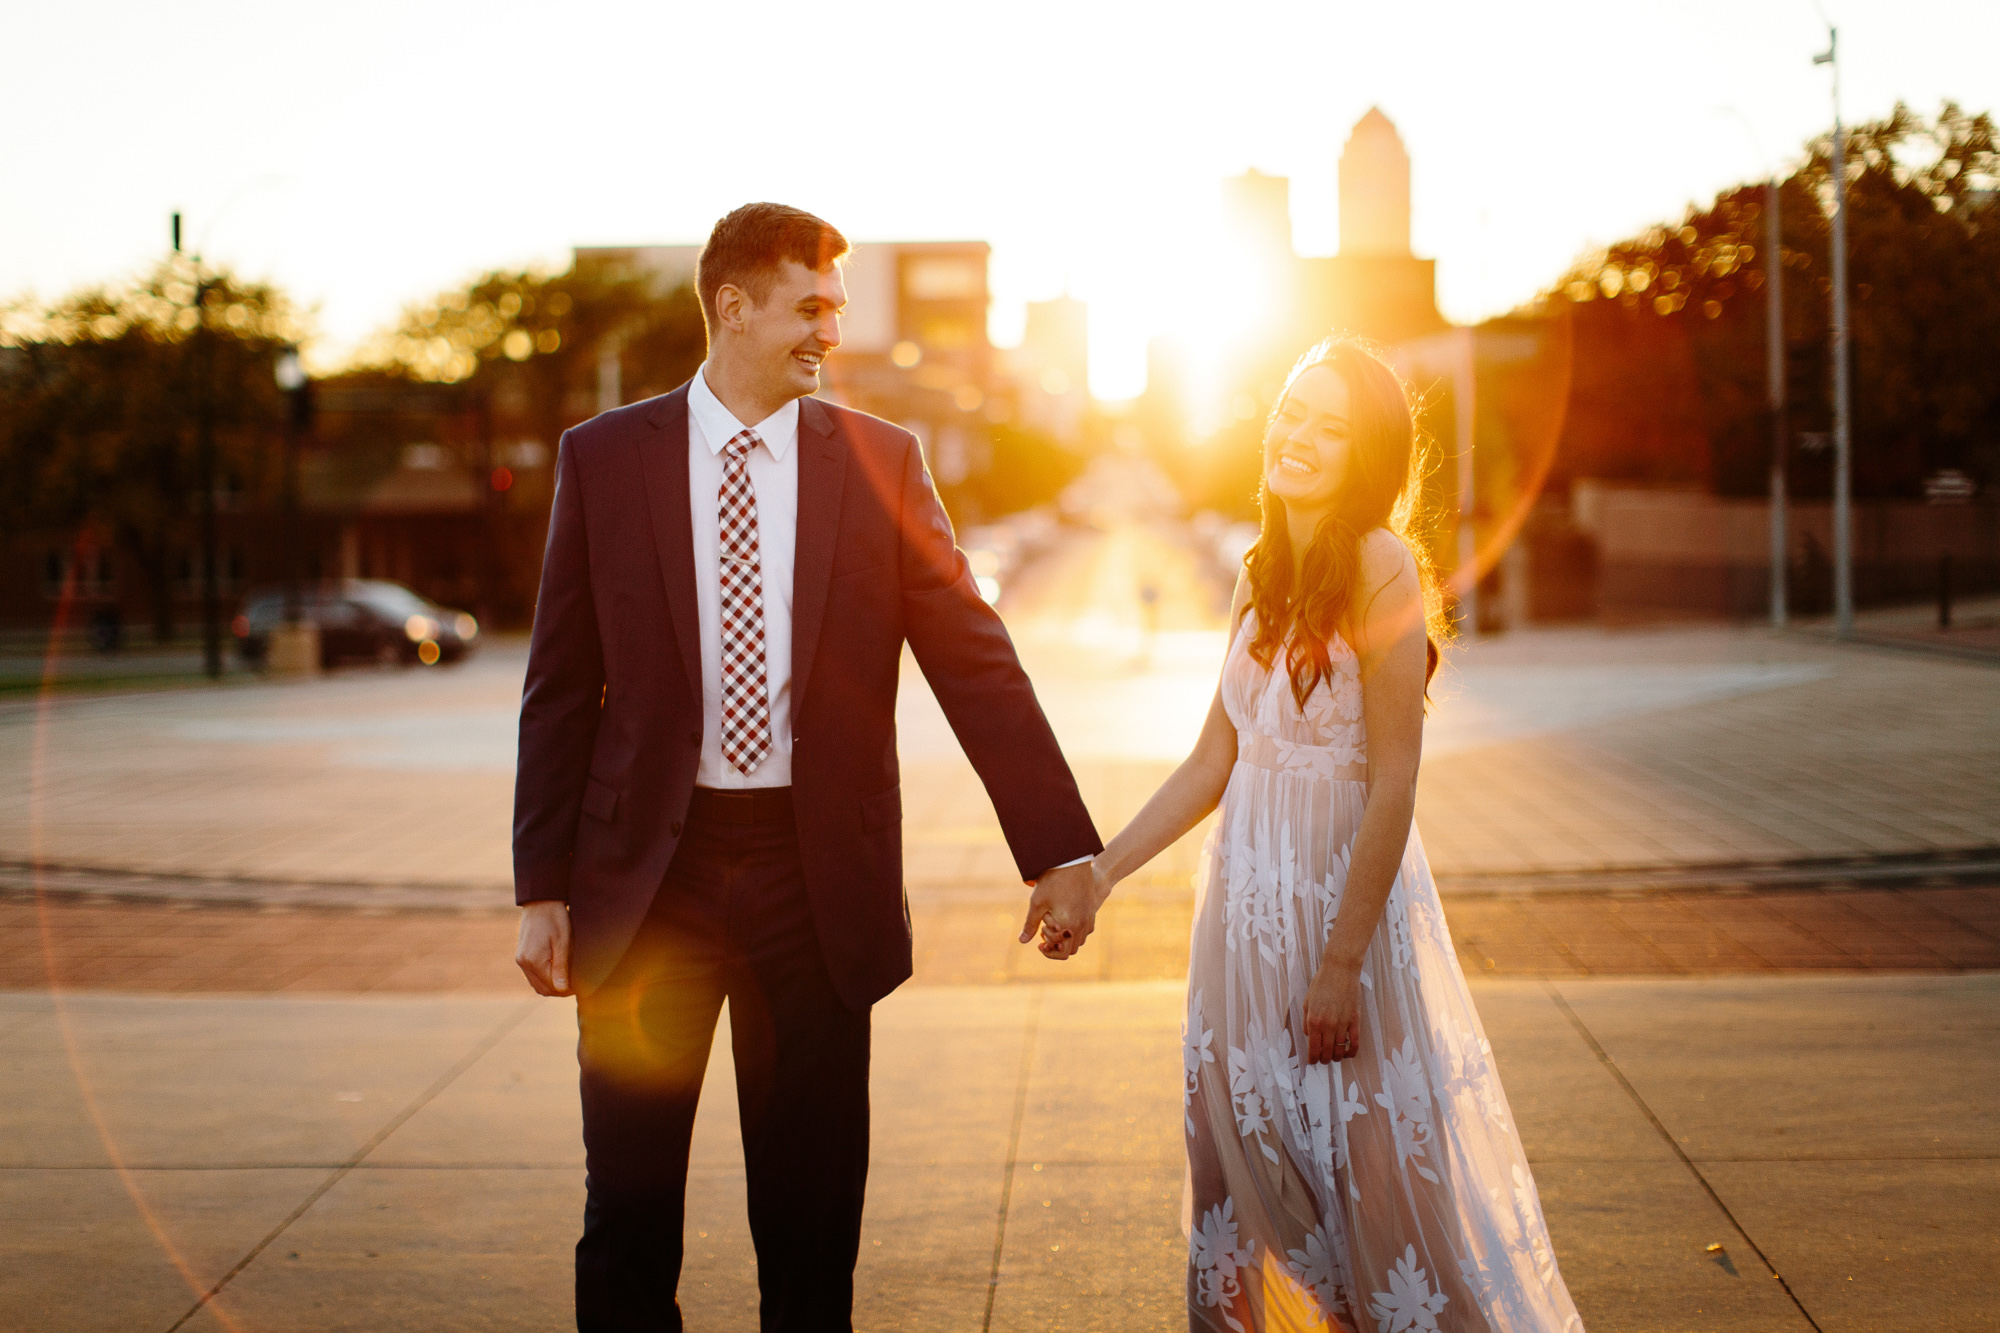 wedding-elopement-adventerous-romantic-timeless-des-moines-siouxfalls-photography-33.jpg